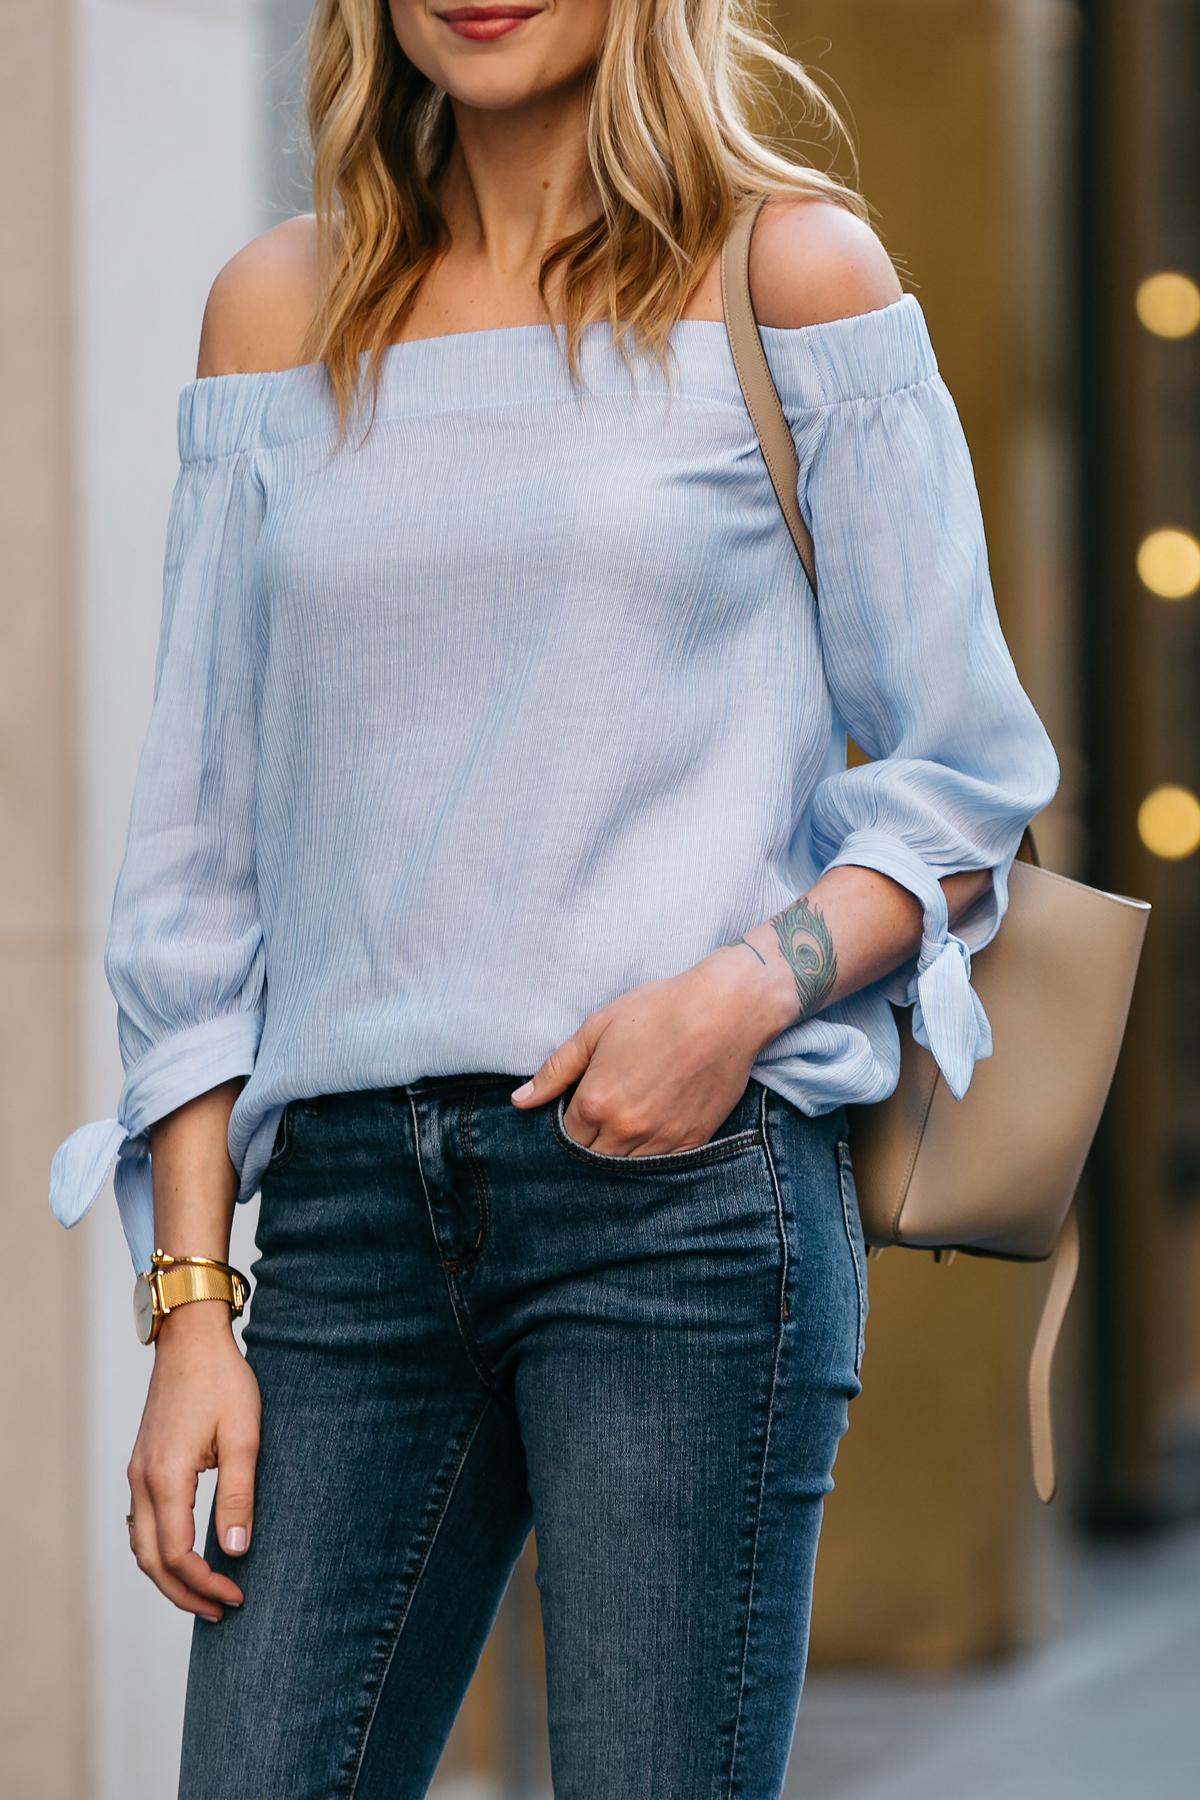 Fashion Jackson, Dallas Blogger, Fashion Blogger, Street Style, Ann Taylor Blue Tie Off-the-shoulder Top, Denim Skinny Jeans